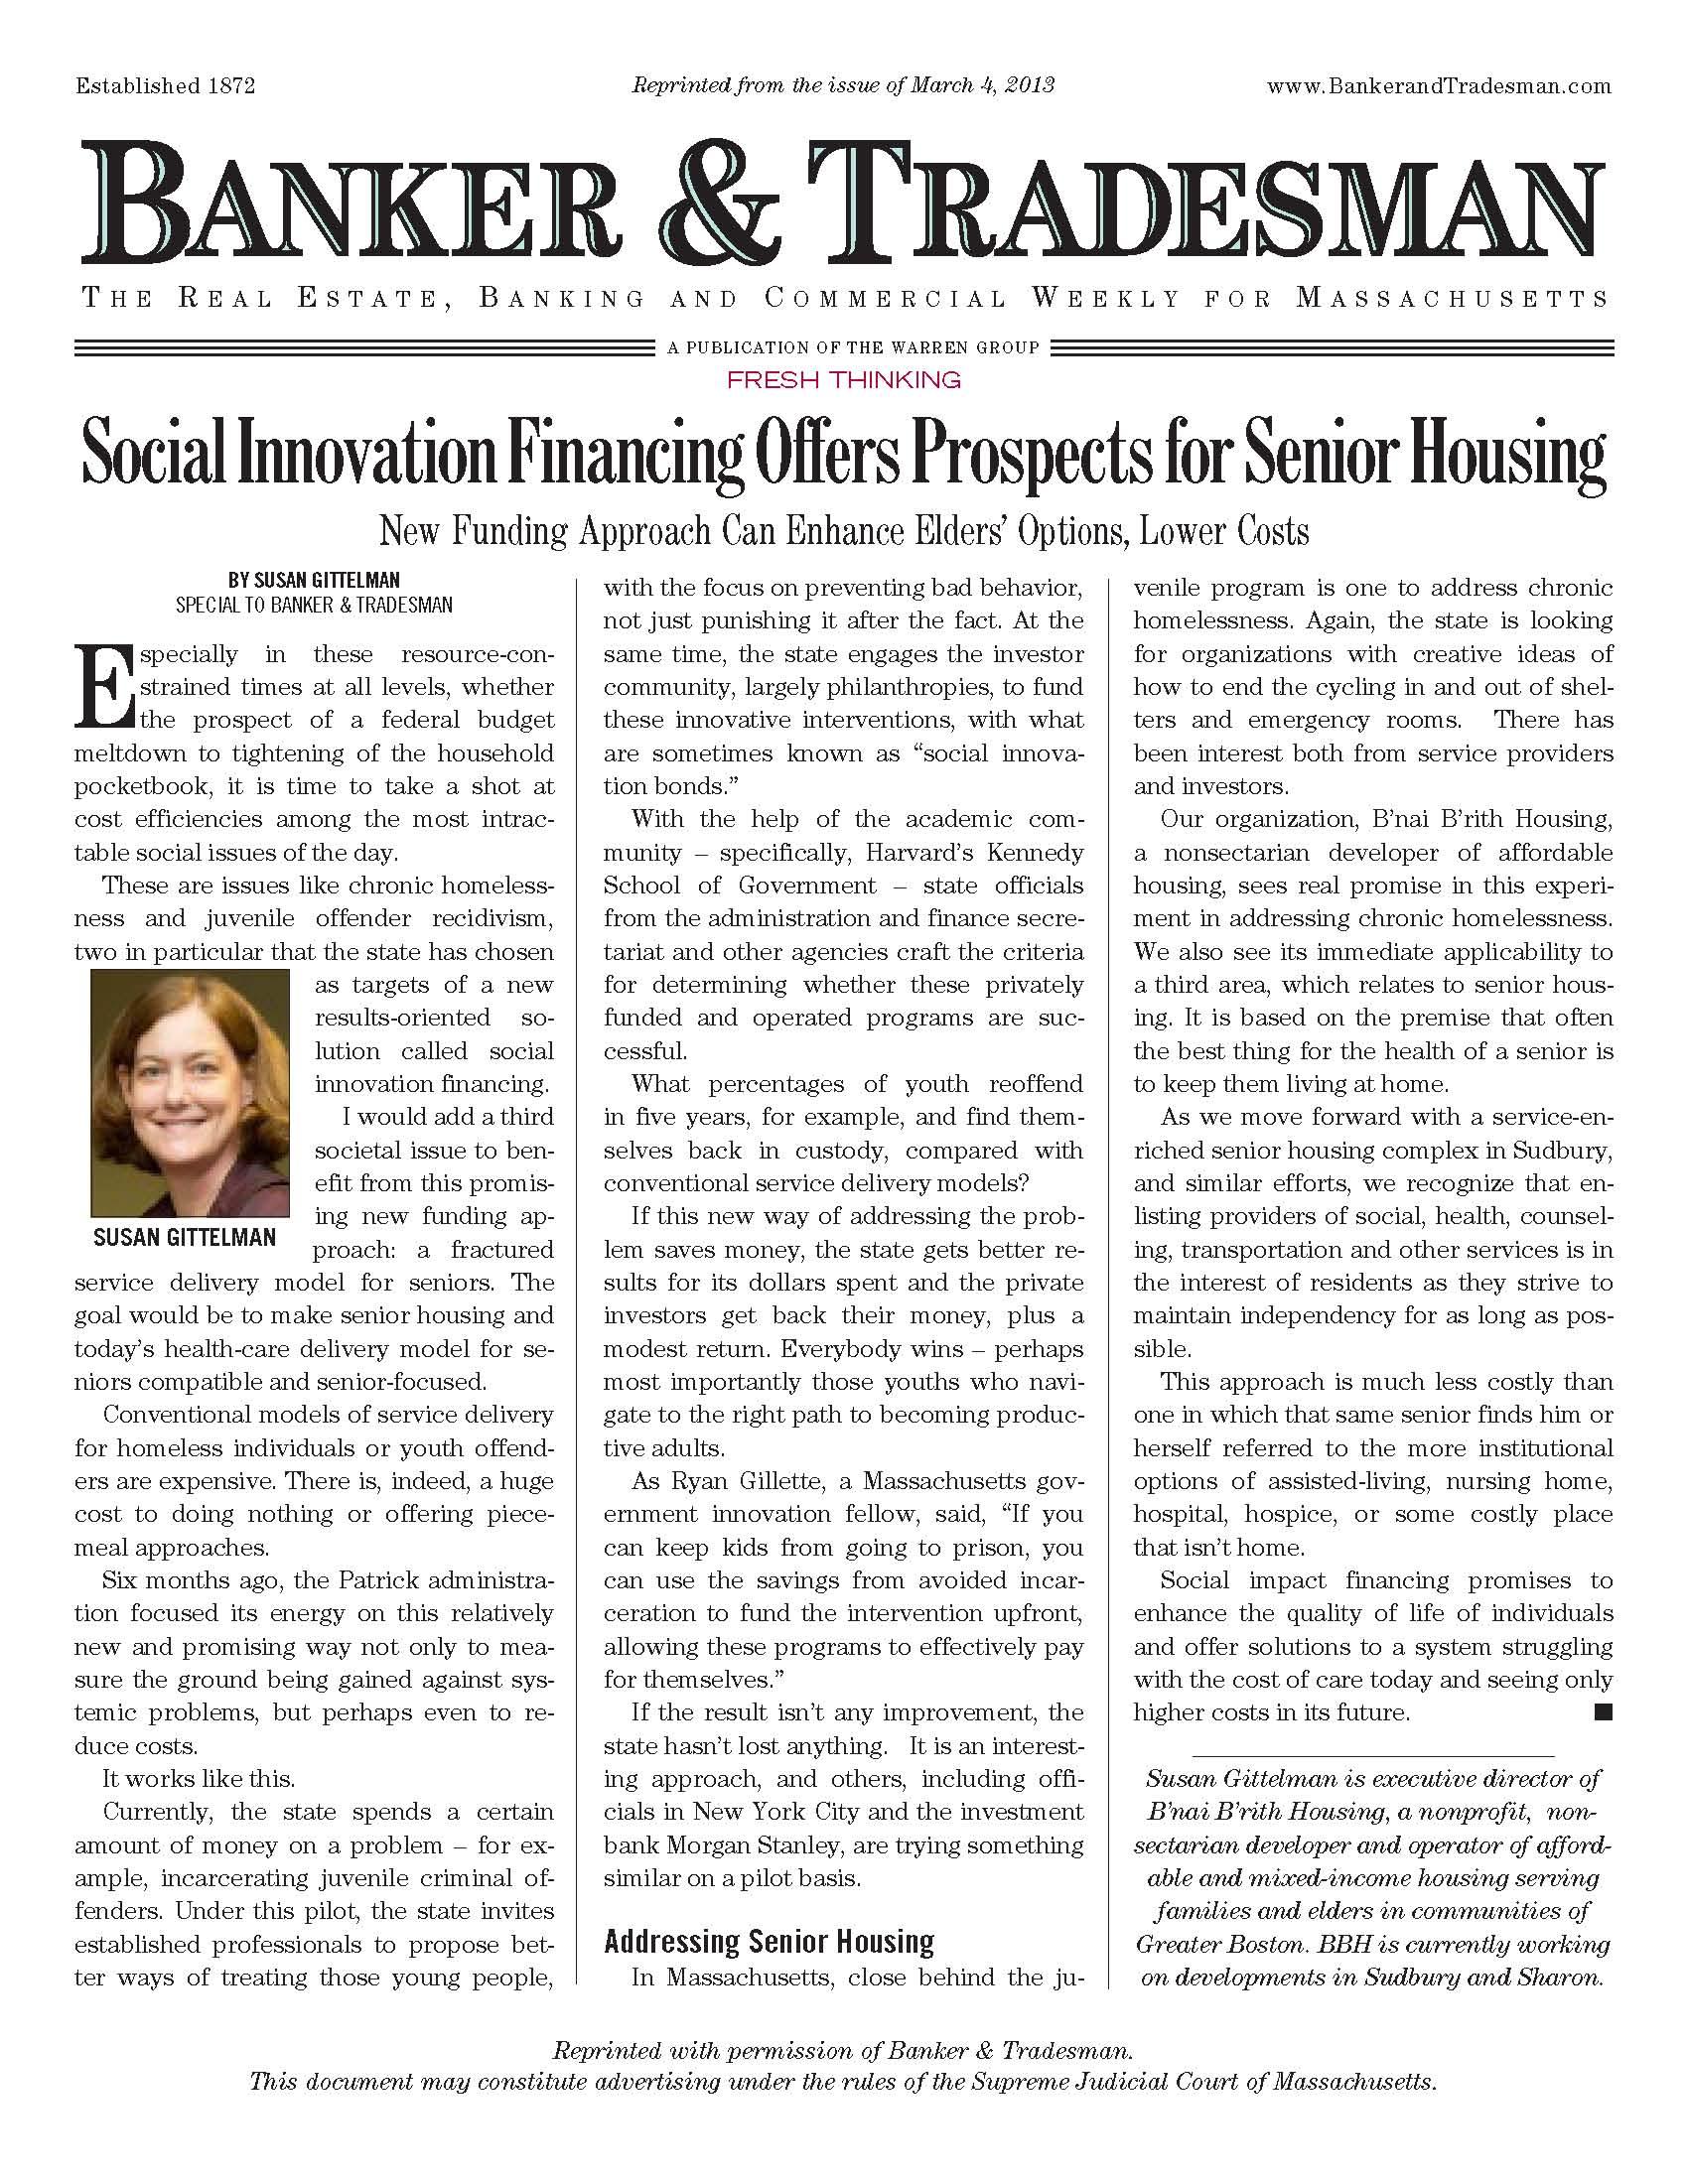 Social Innovation Financing Offers Prospects for Senior Housing